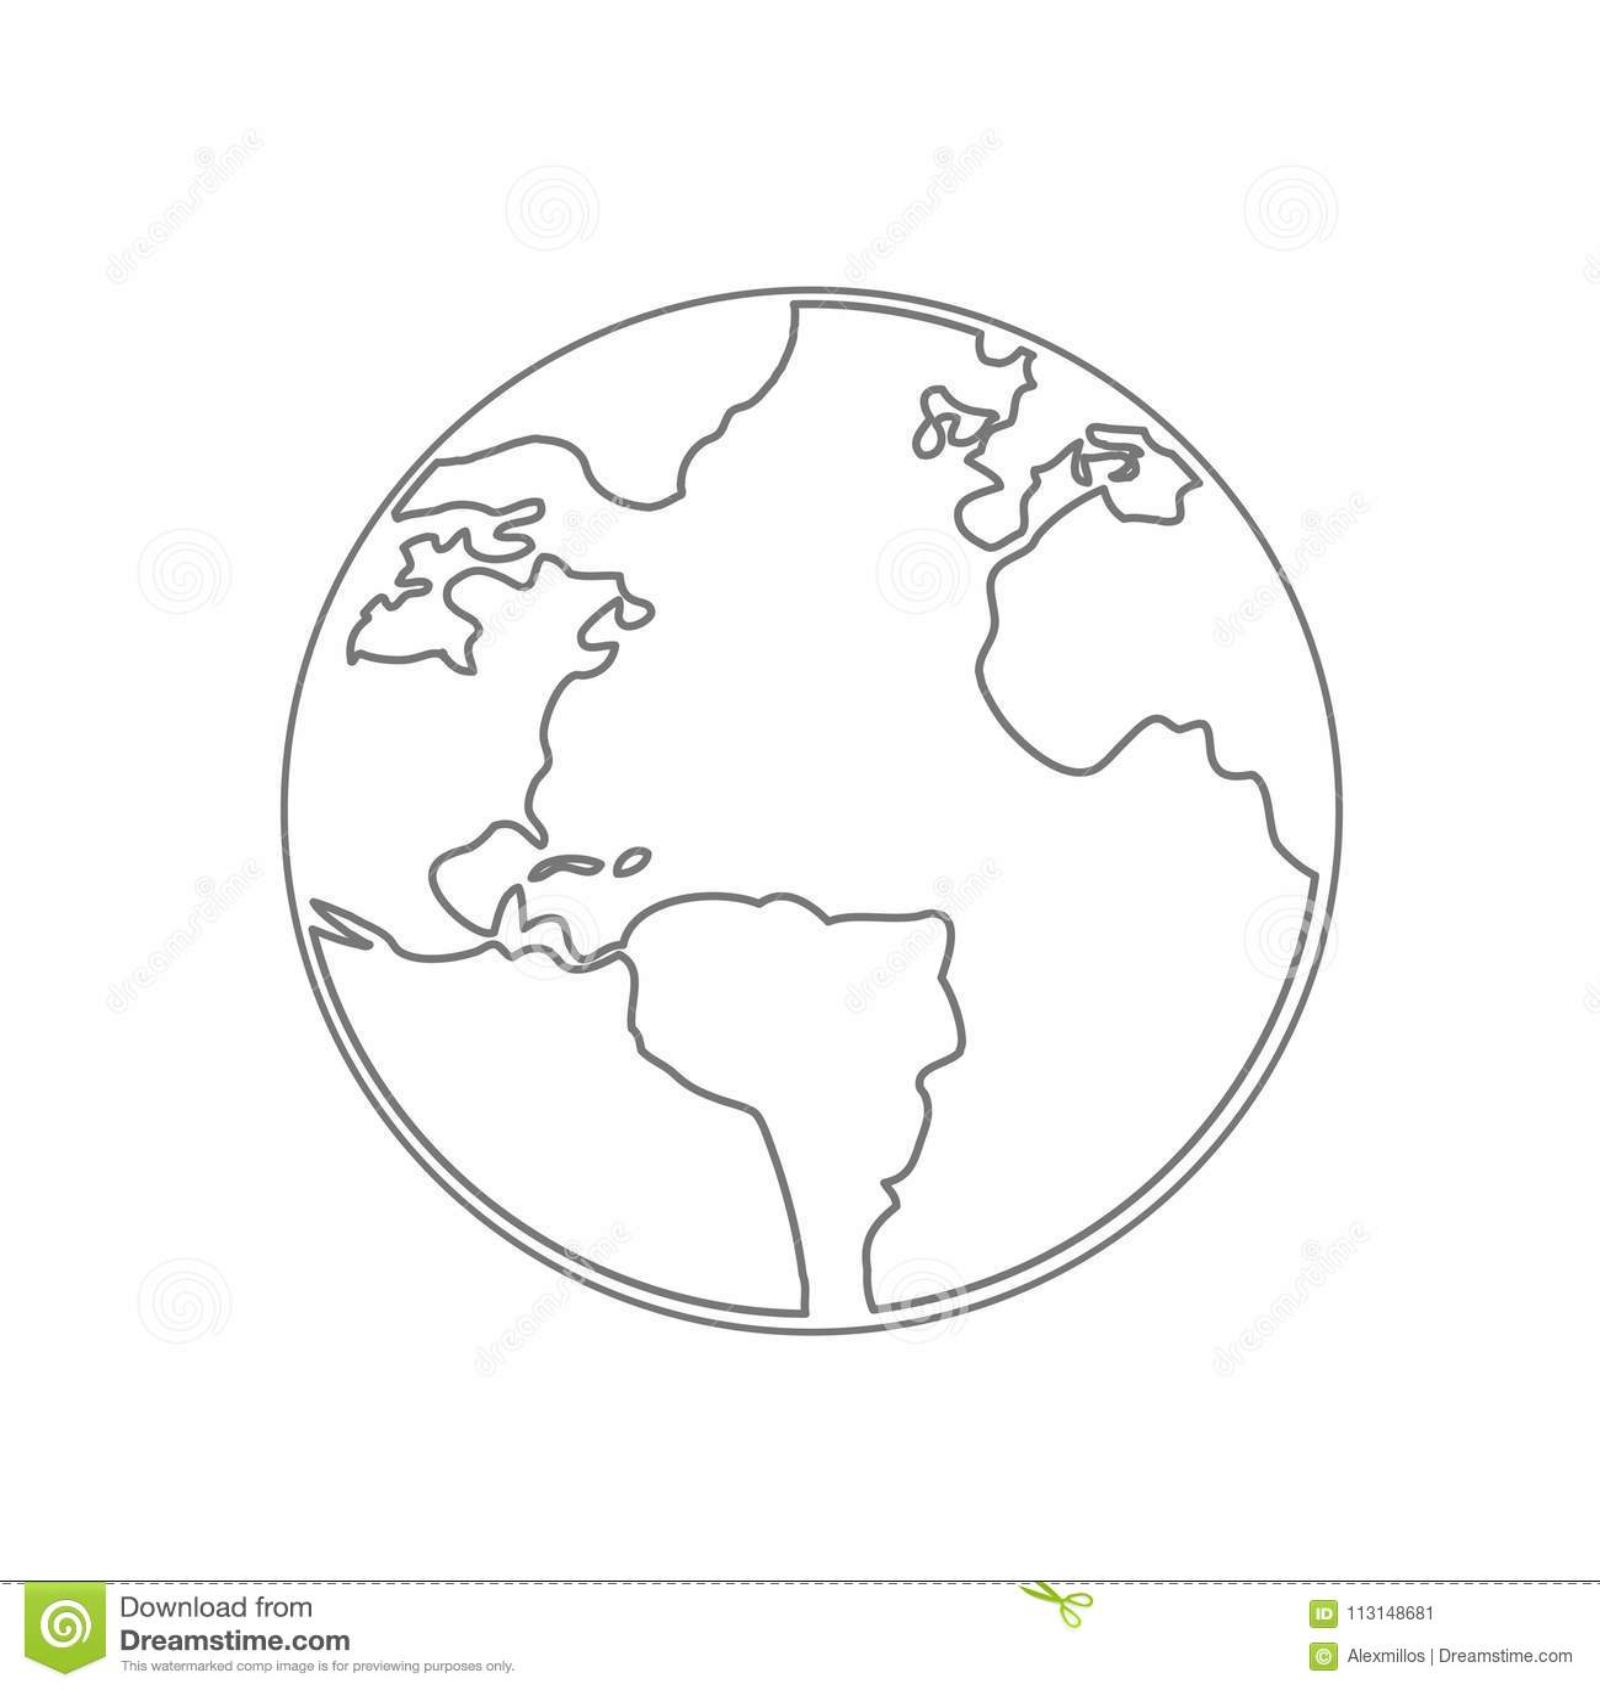 World Map Earth Globe Vector line Sketched Up Illustrator.